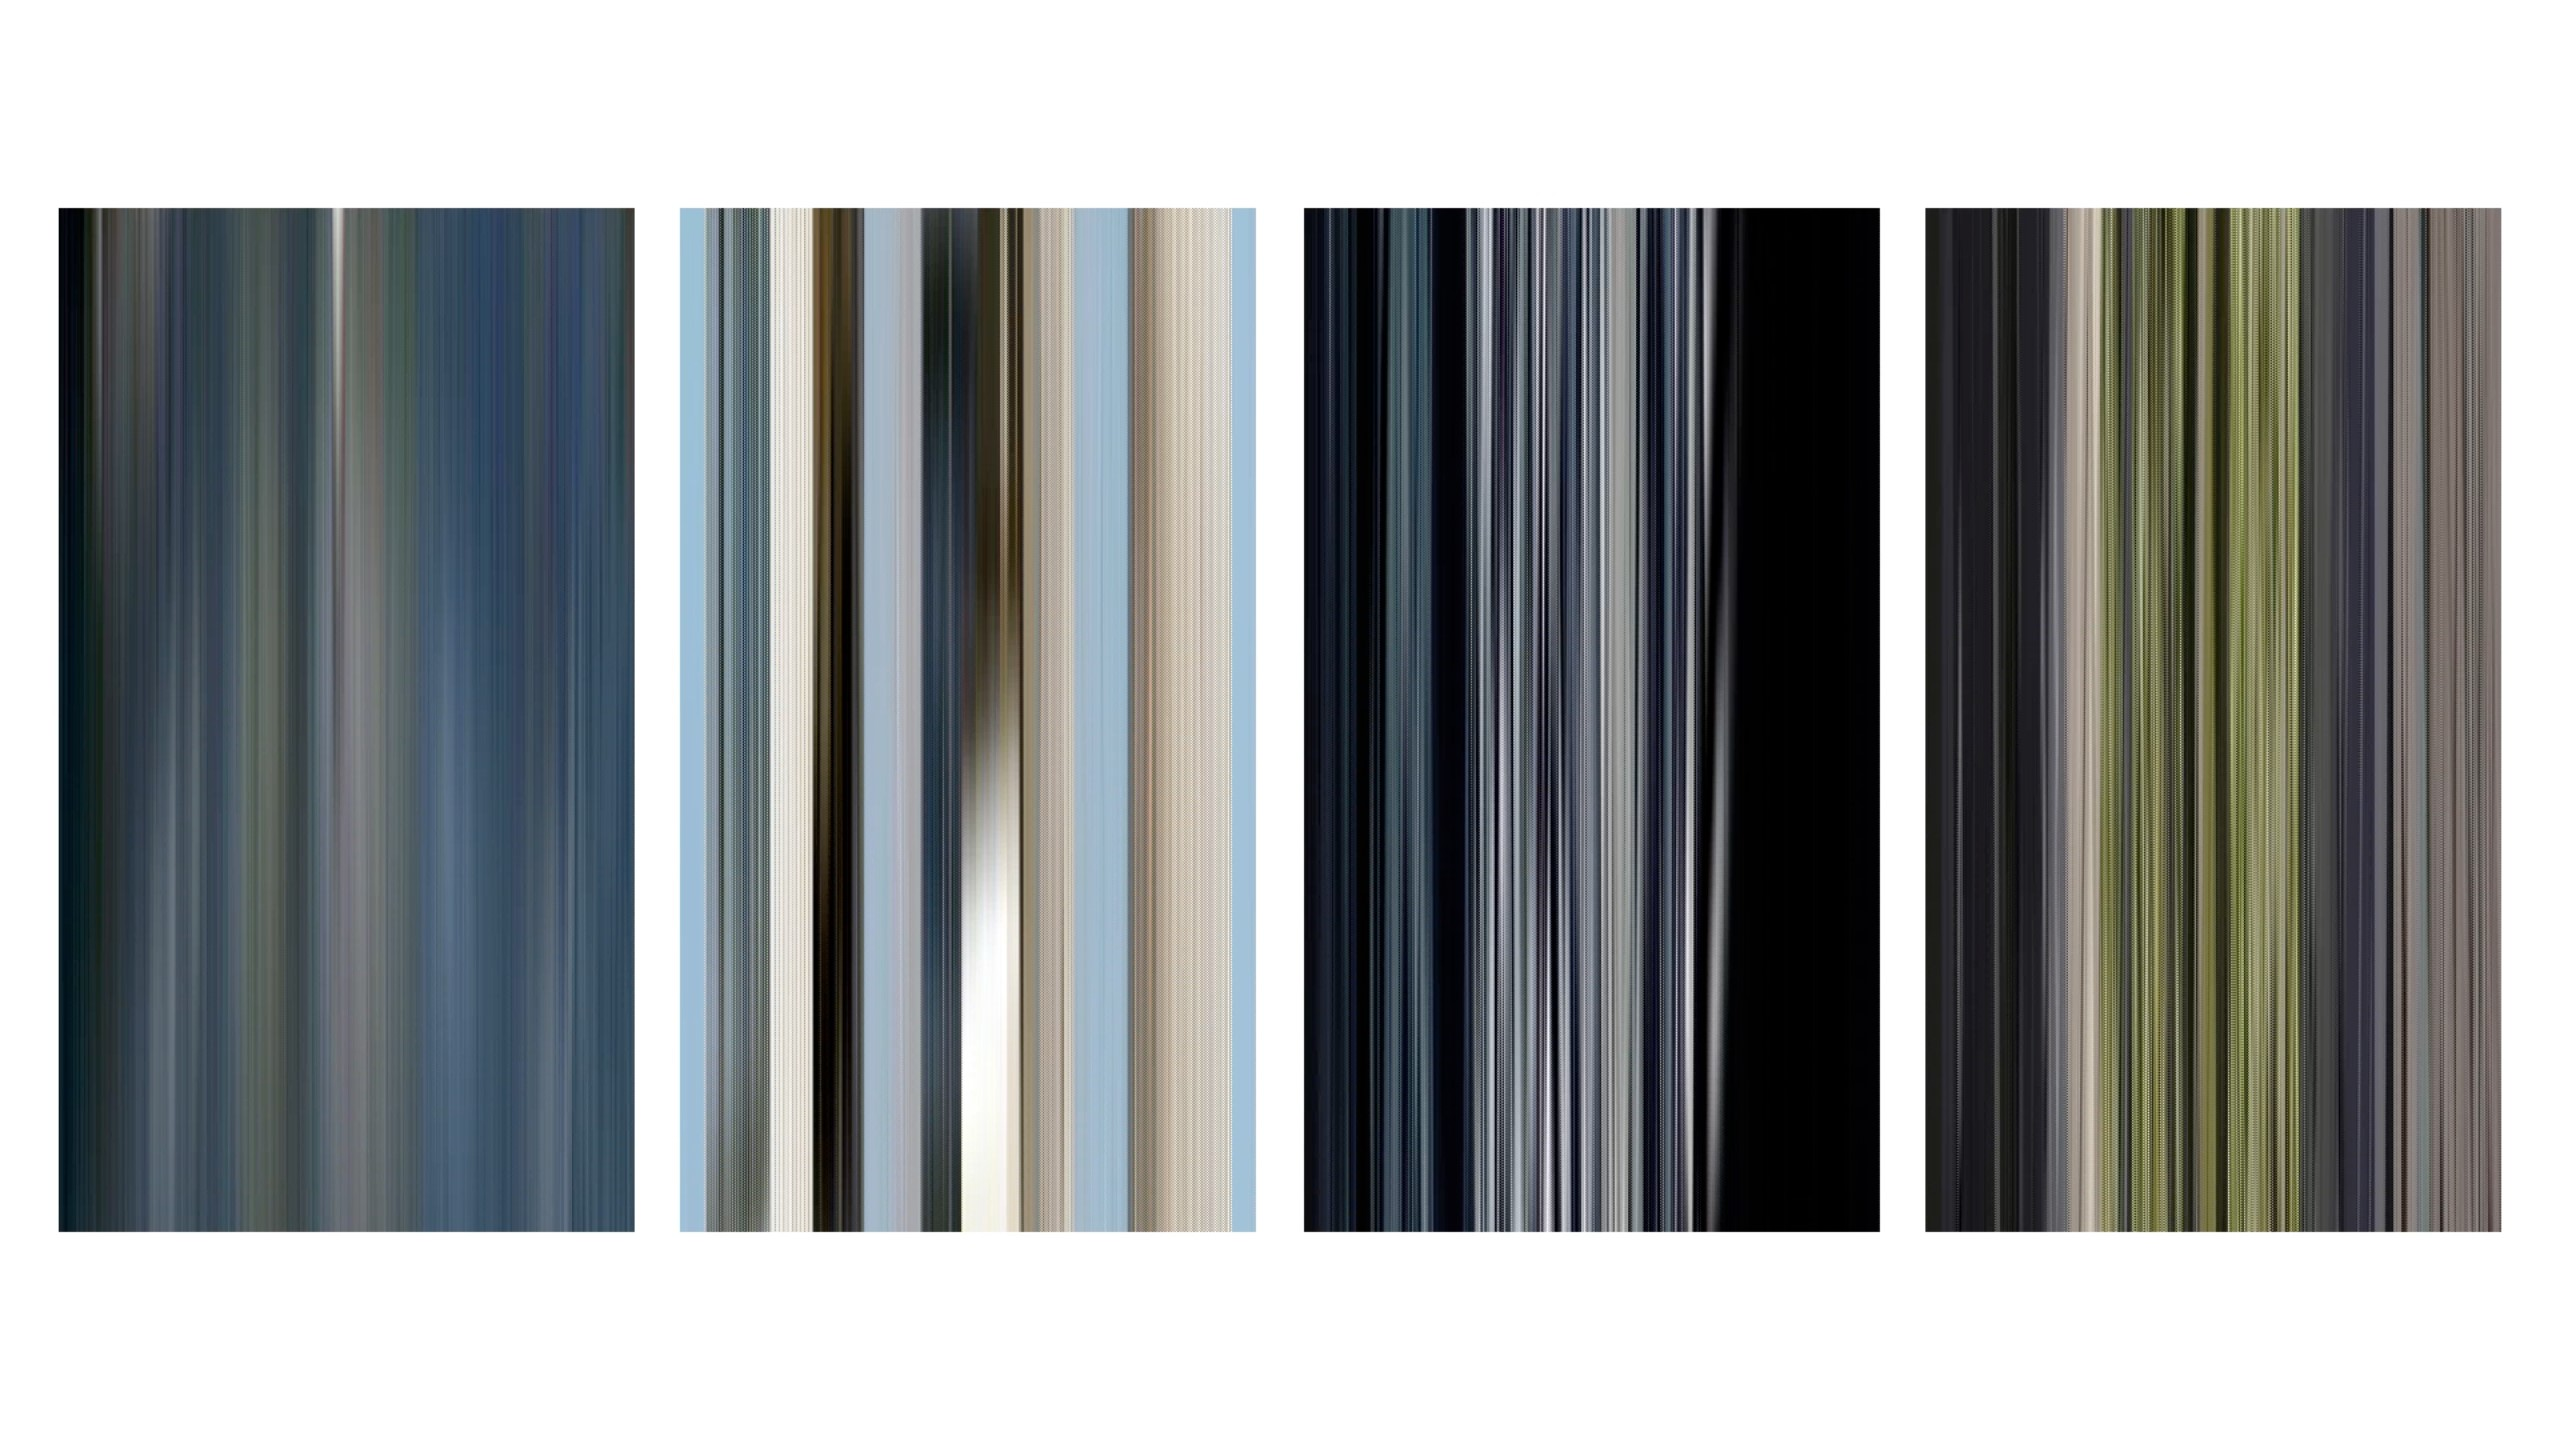 2014-06-02-WTCin4momentsscreencapture5.52minutes2.jpg